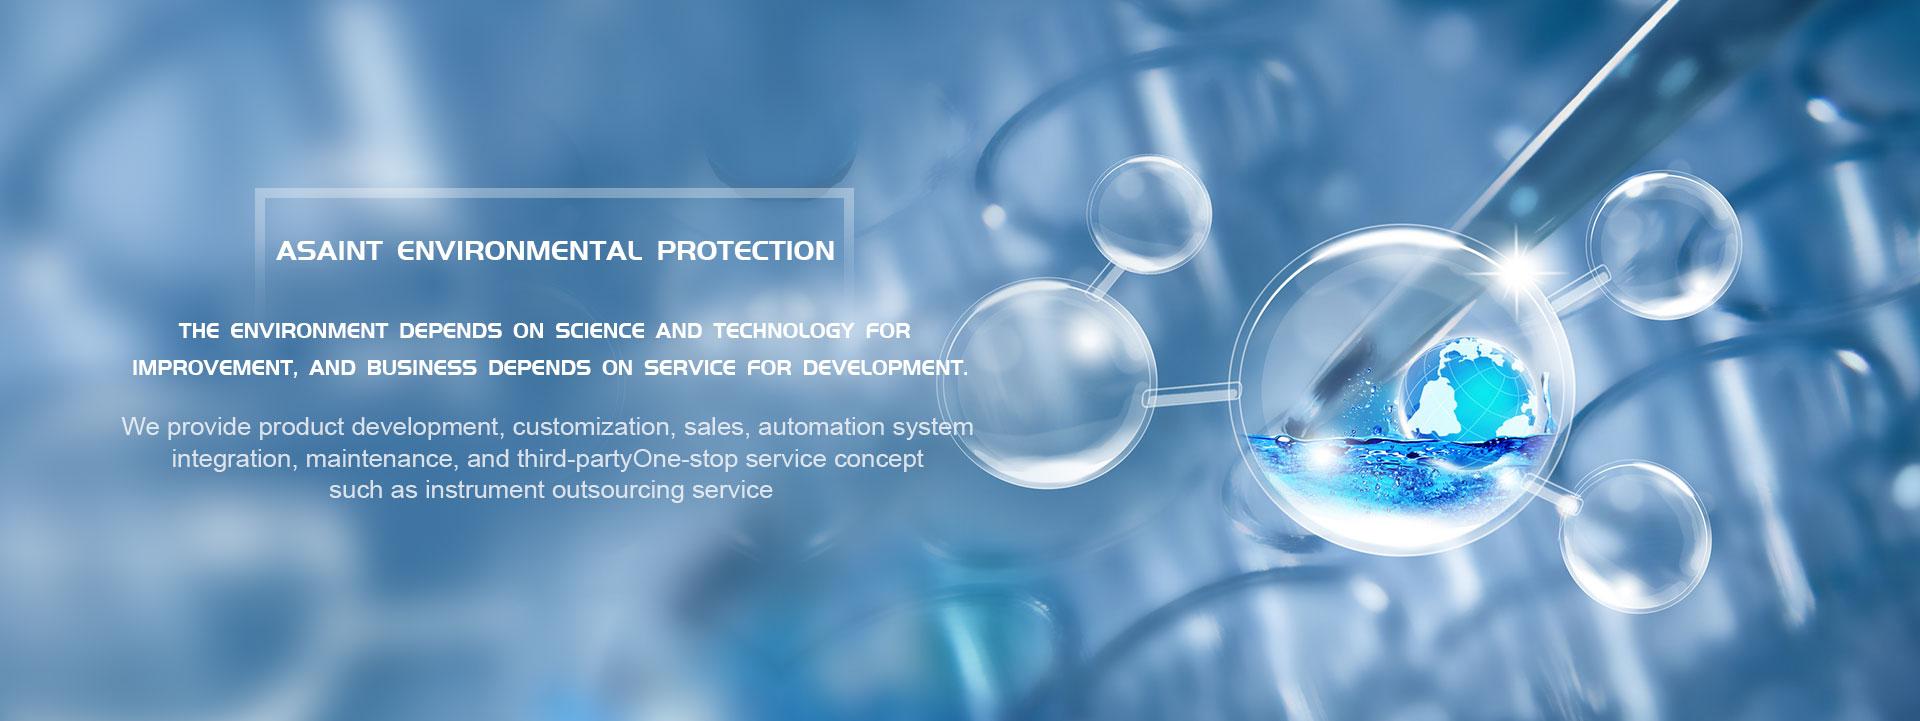 Shanghai Asaint Environmental Science and Technology Co., Ltd